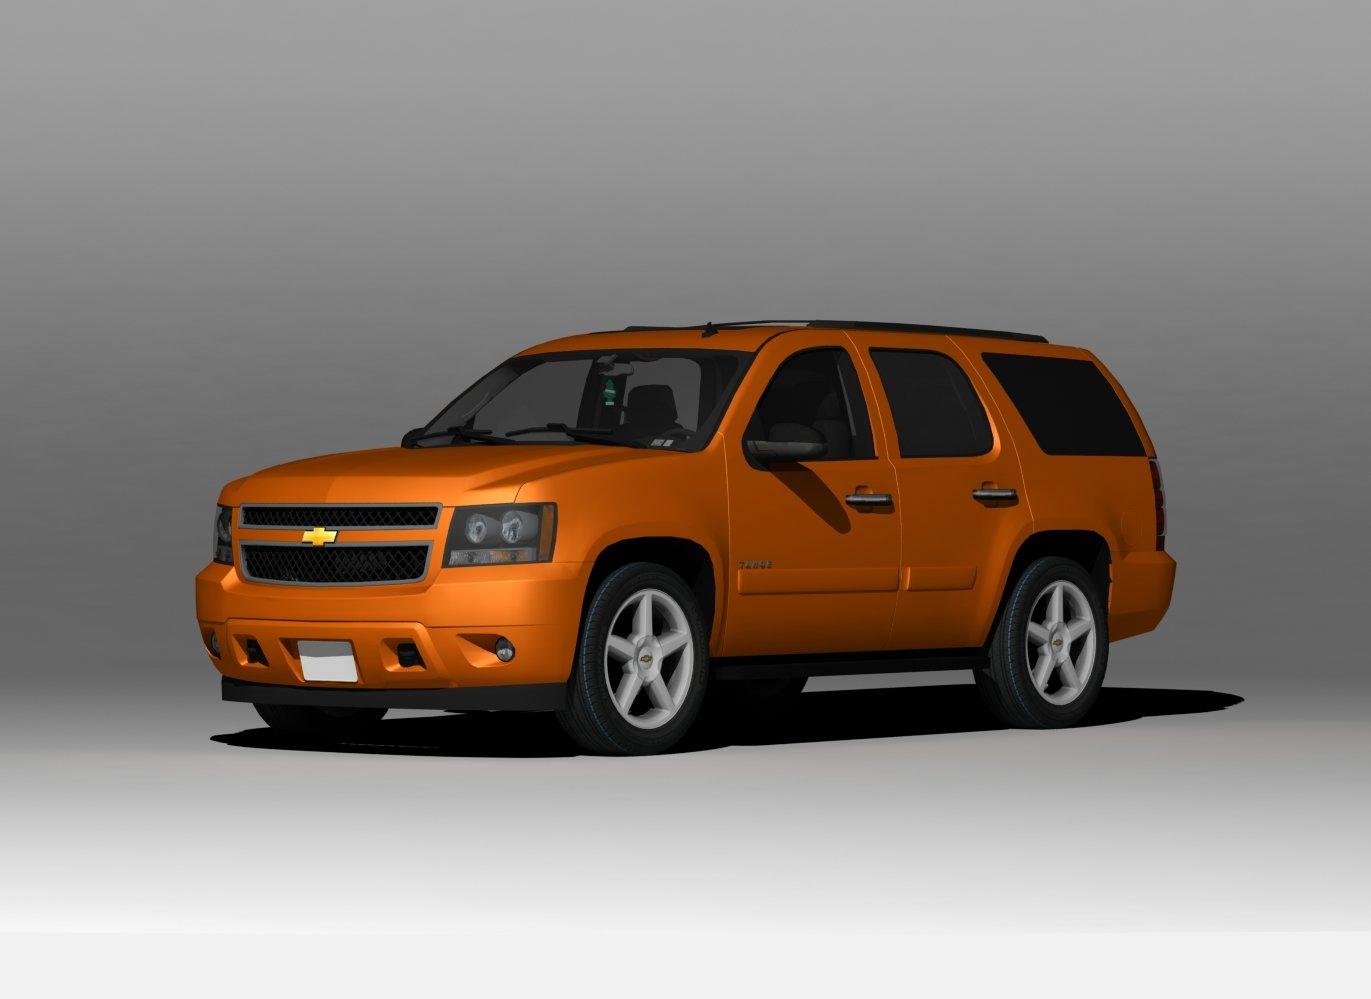 Chevrolet Tahoe 2008 Free 3d Models